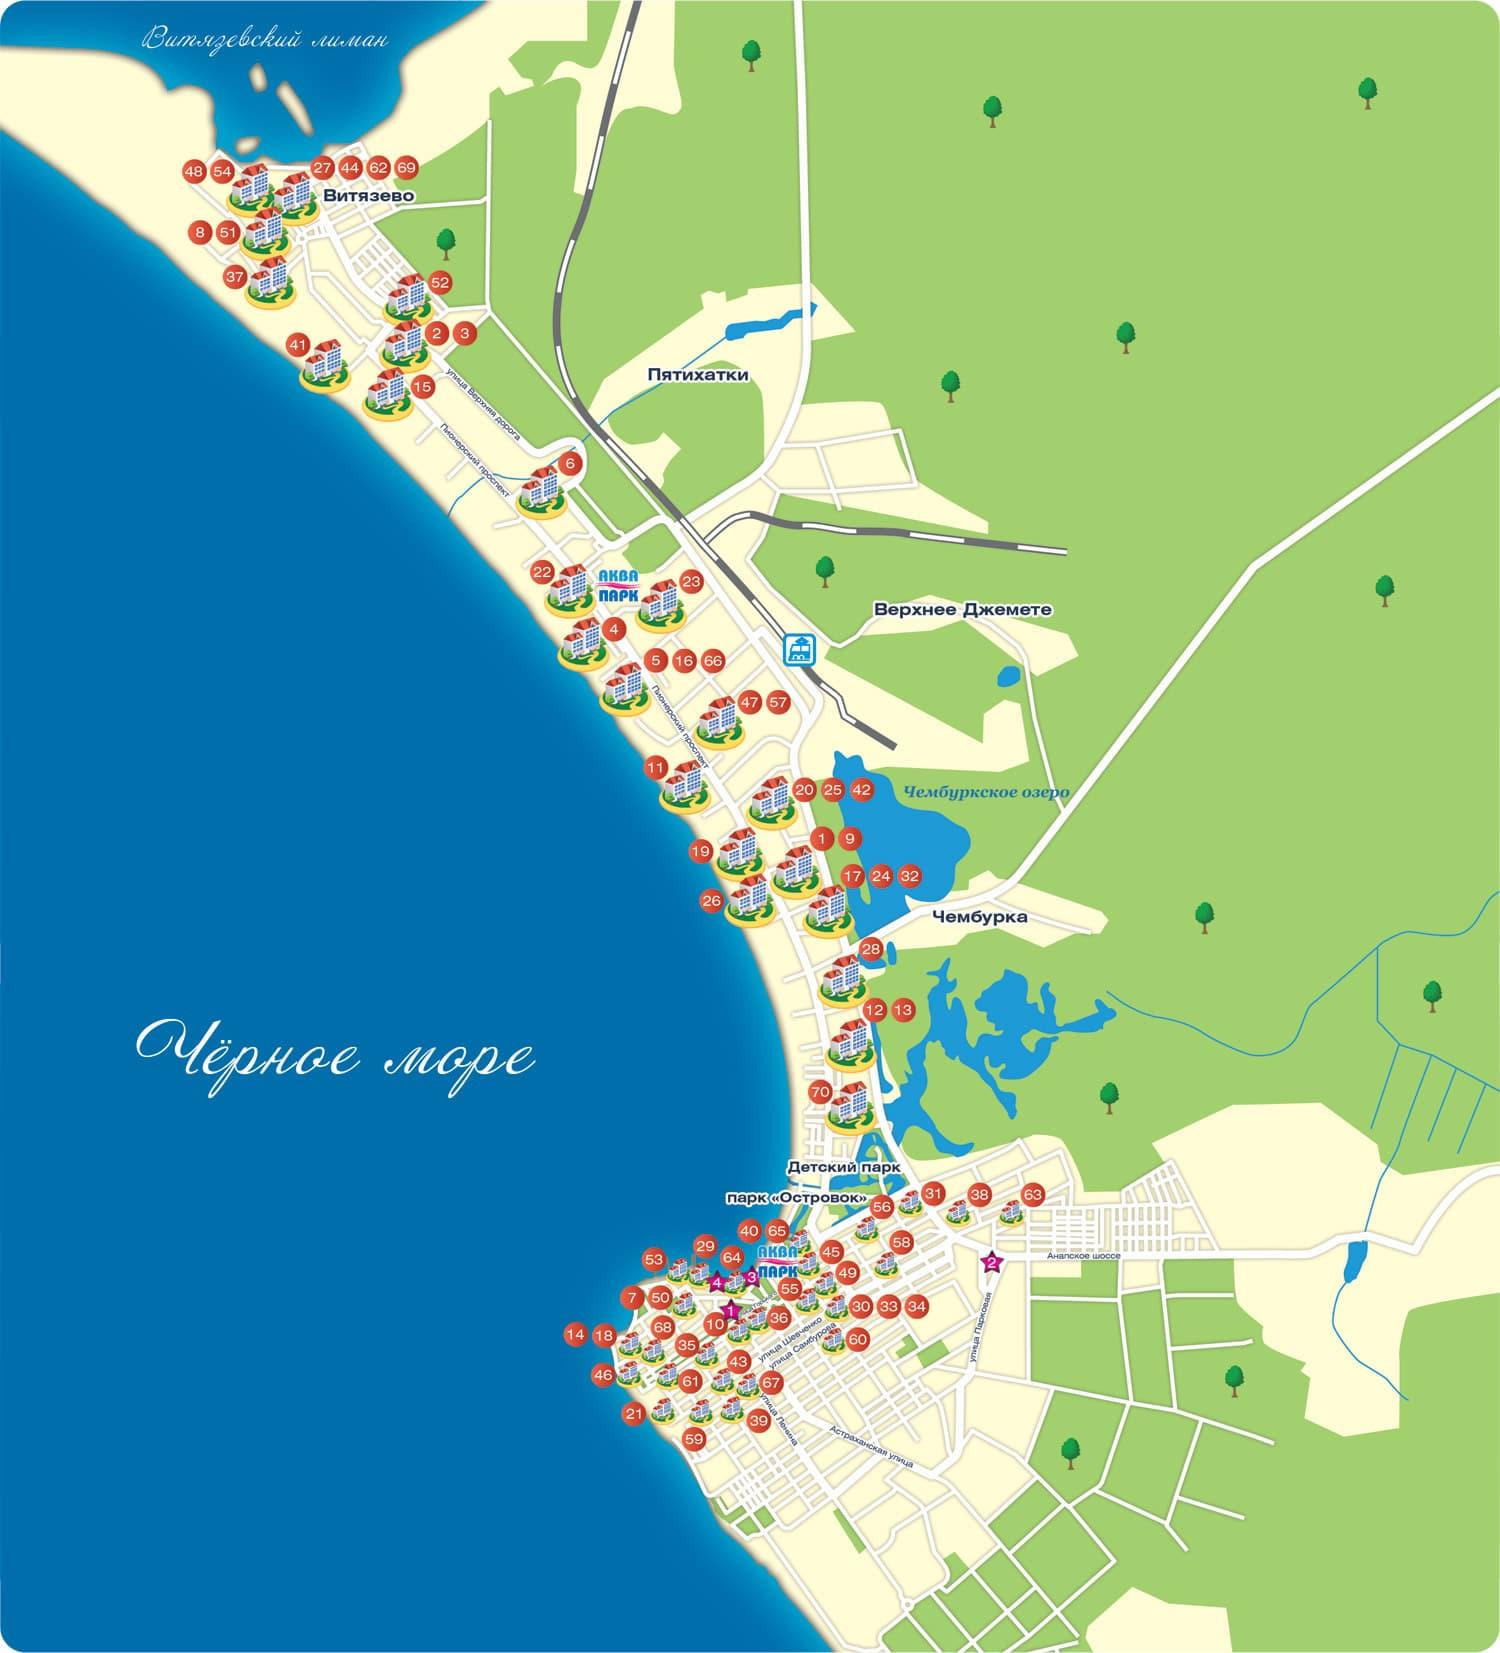 Карта анапы с улицами и домами карта города анапа